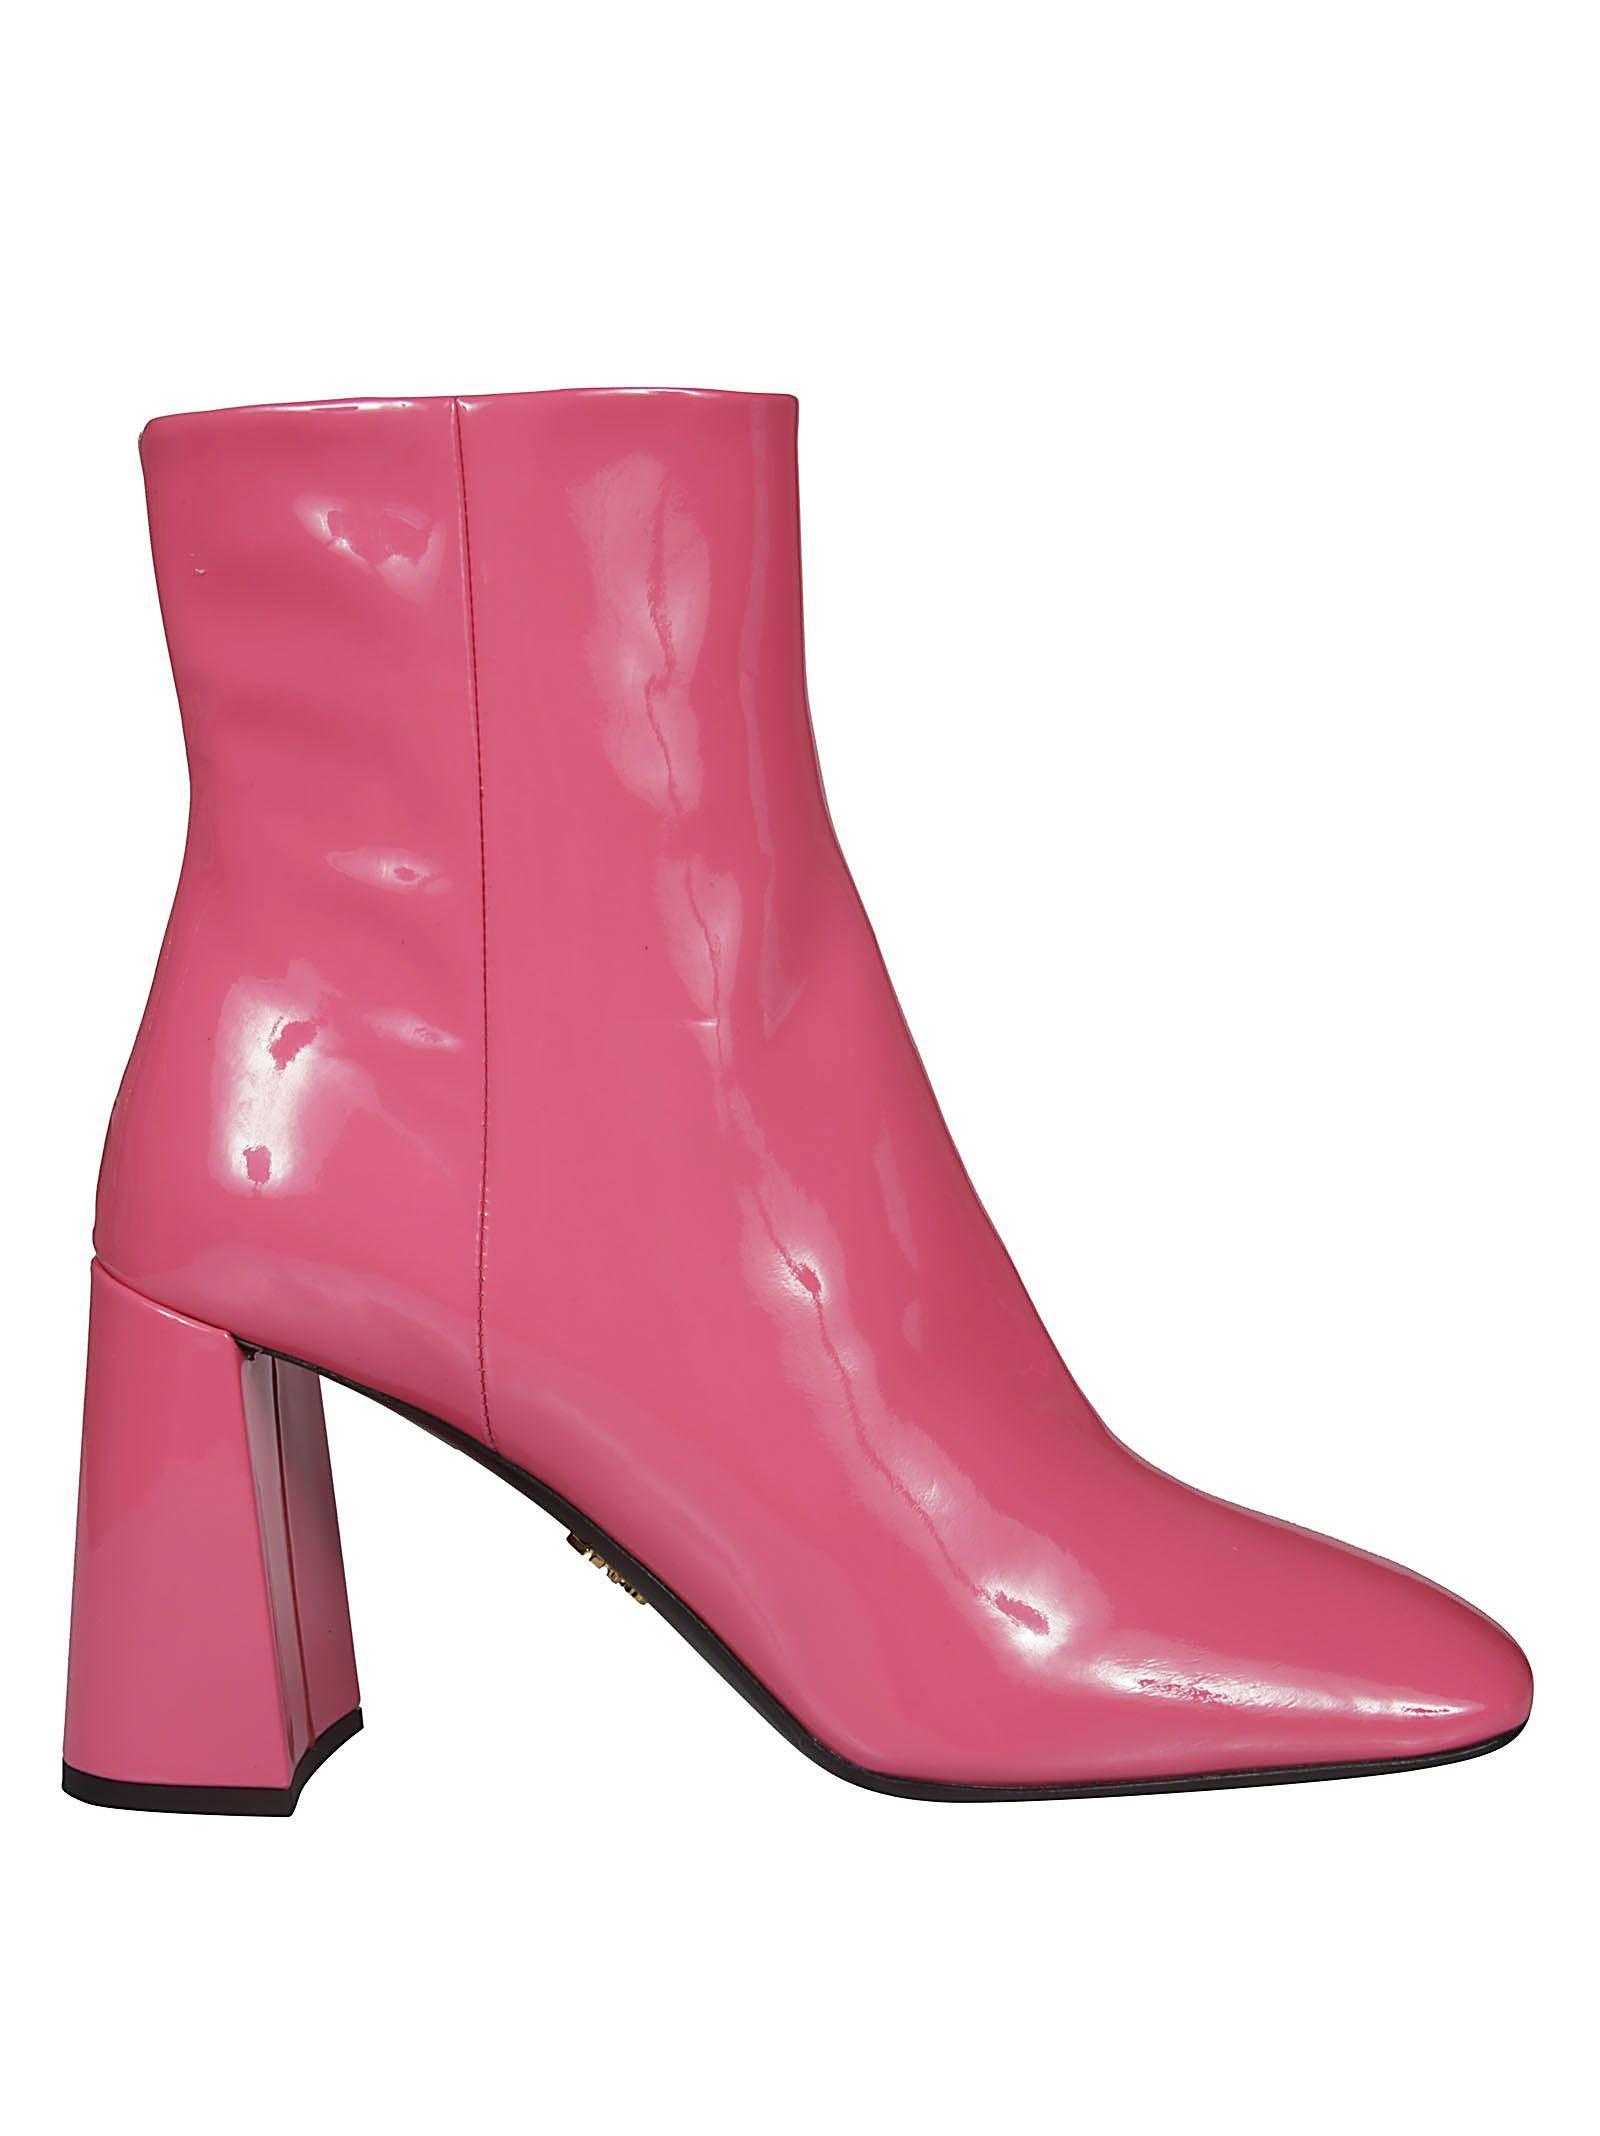 prada boots pink